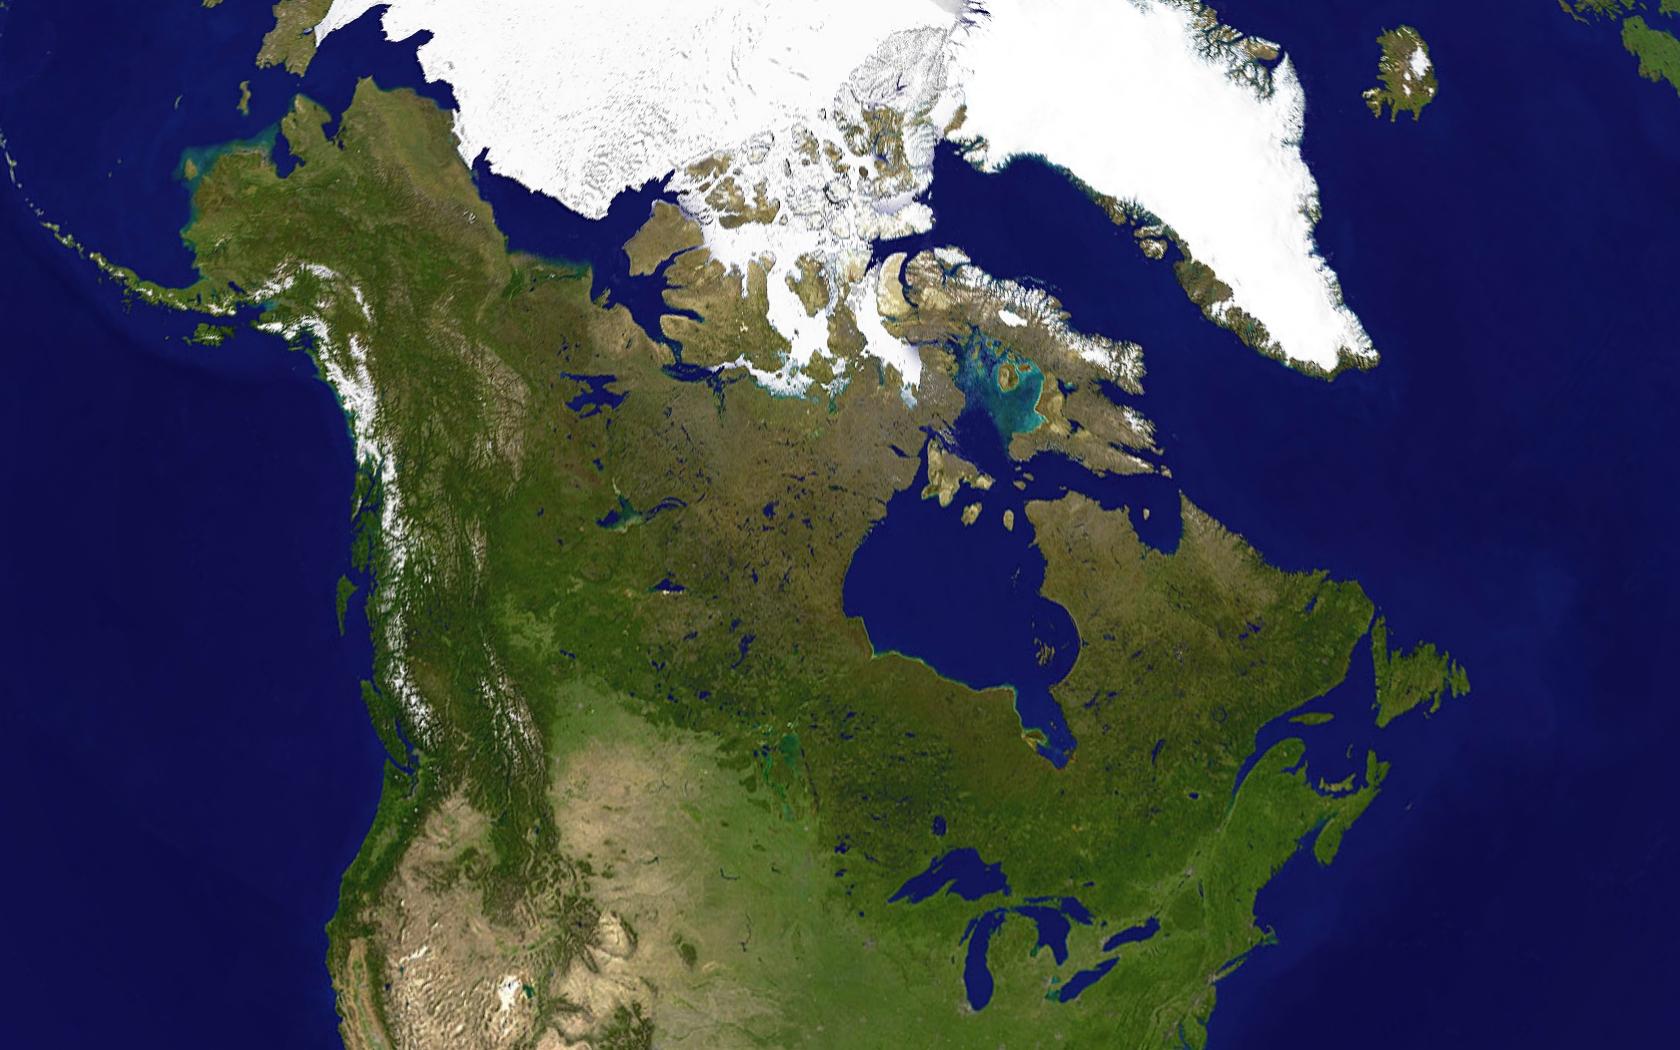 http://upload.wikimedia.org/wikipedia/commons/a/ae/Canada-satellite.jpg